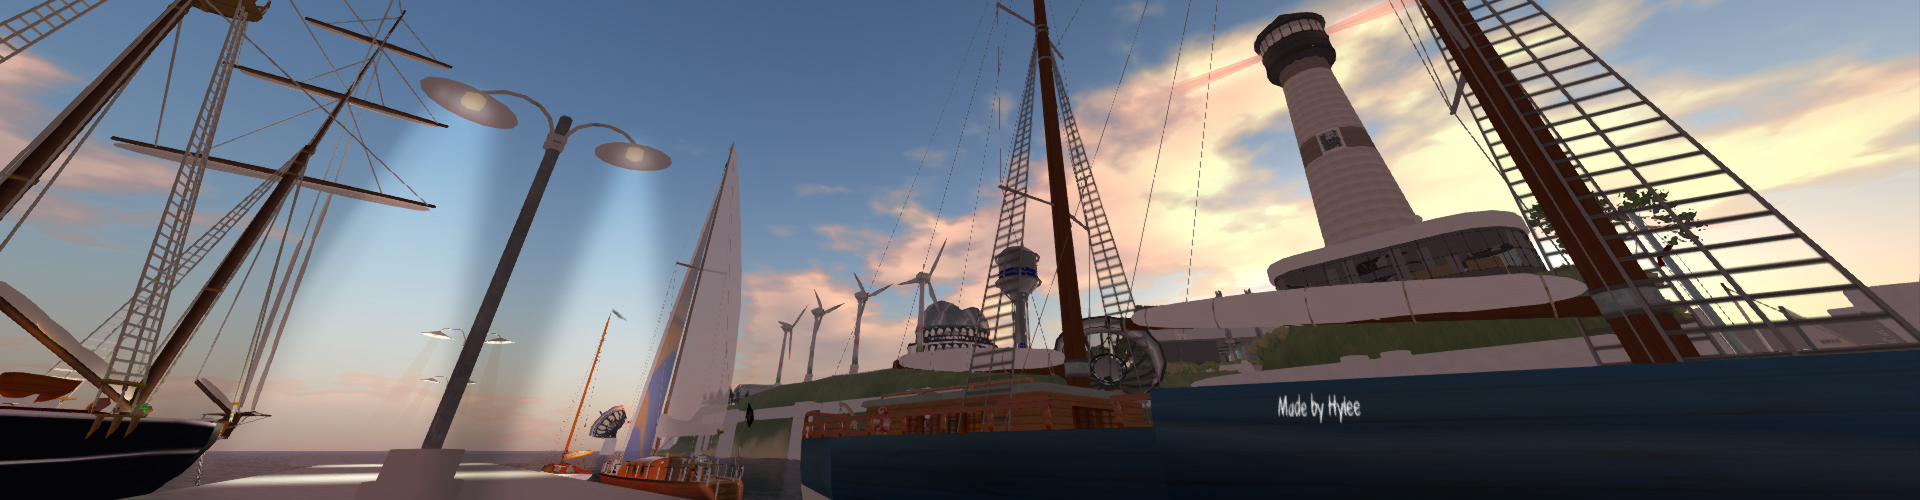 virtualmintaka-opensim-puerto-actividades-nauticas